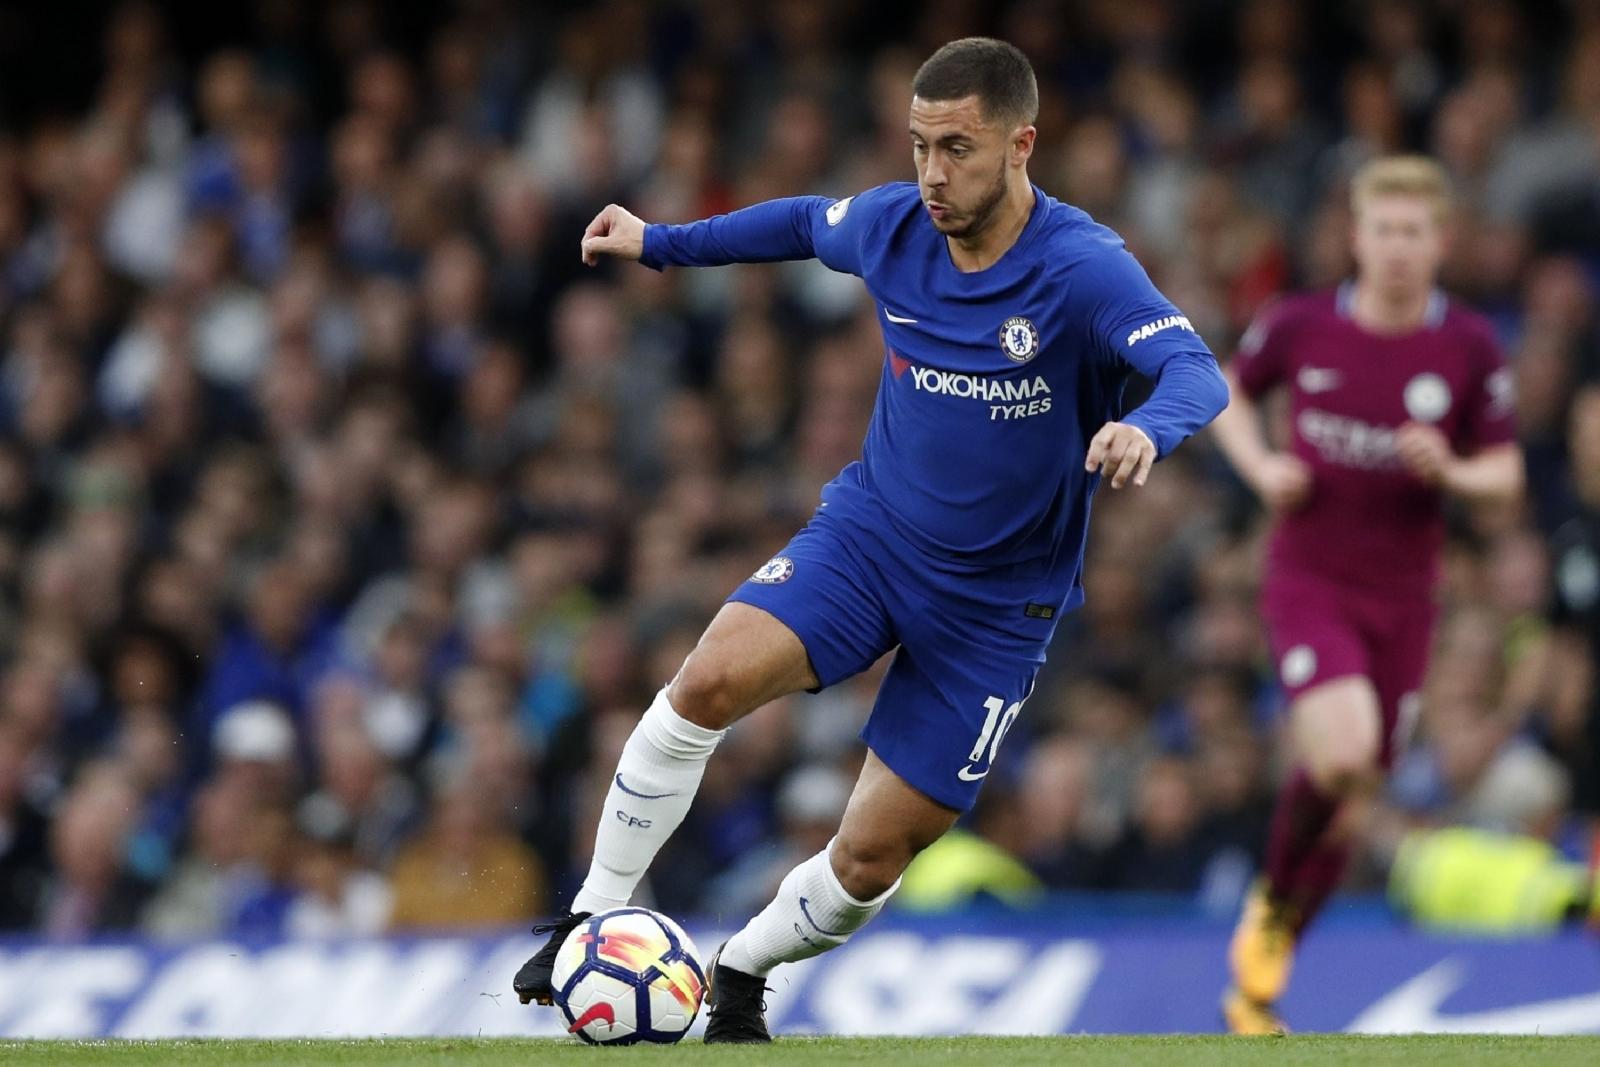 'I Will Play Bad': Chelsea's Eden Hazard Calls For